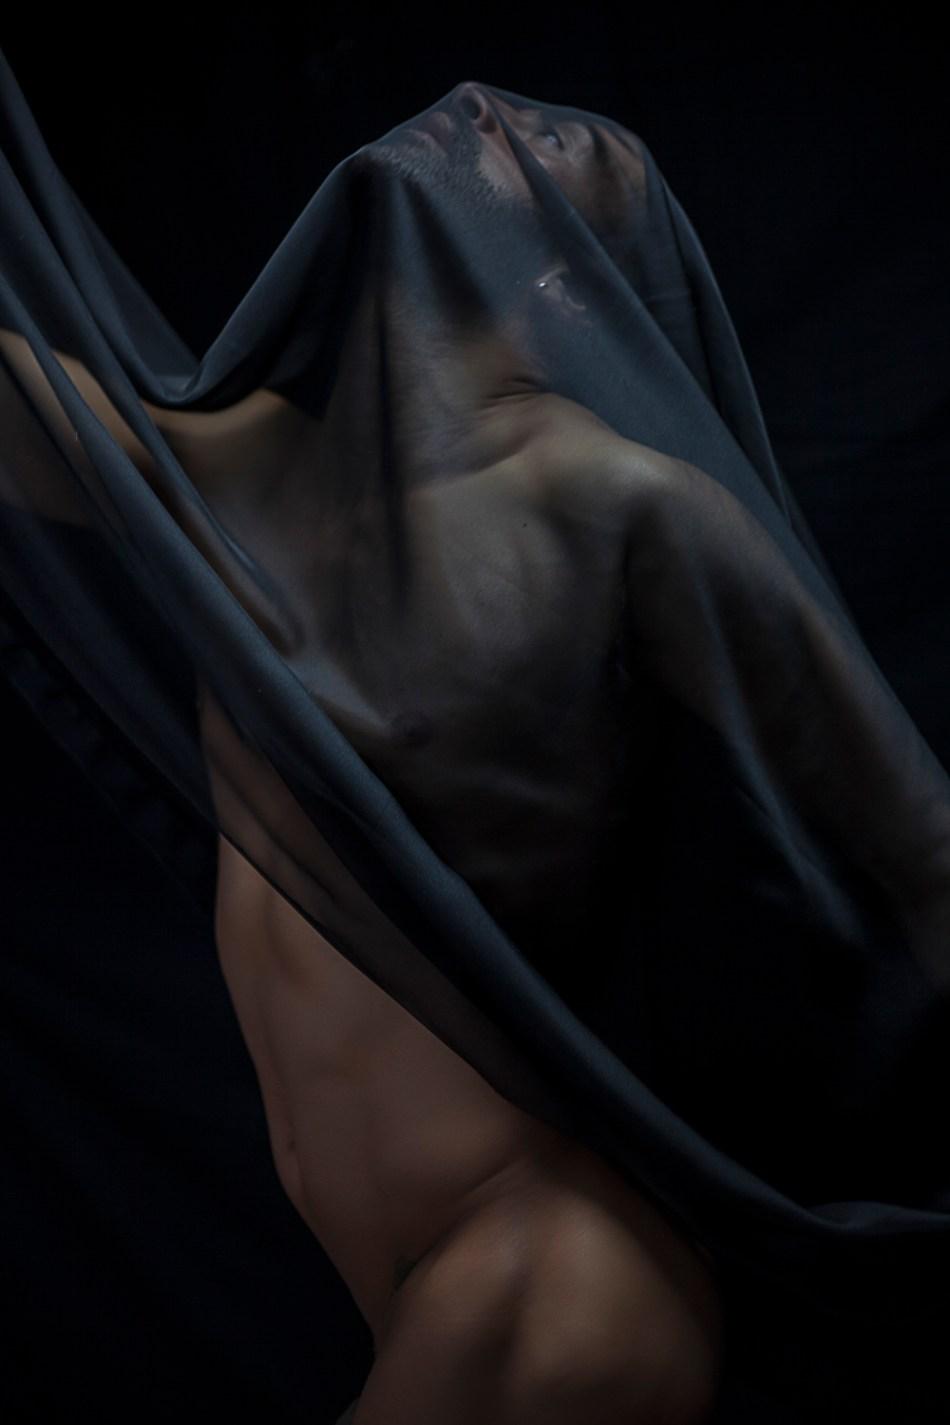 andrea-salvini-photographer-1